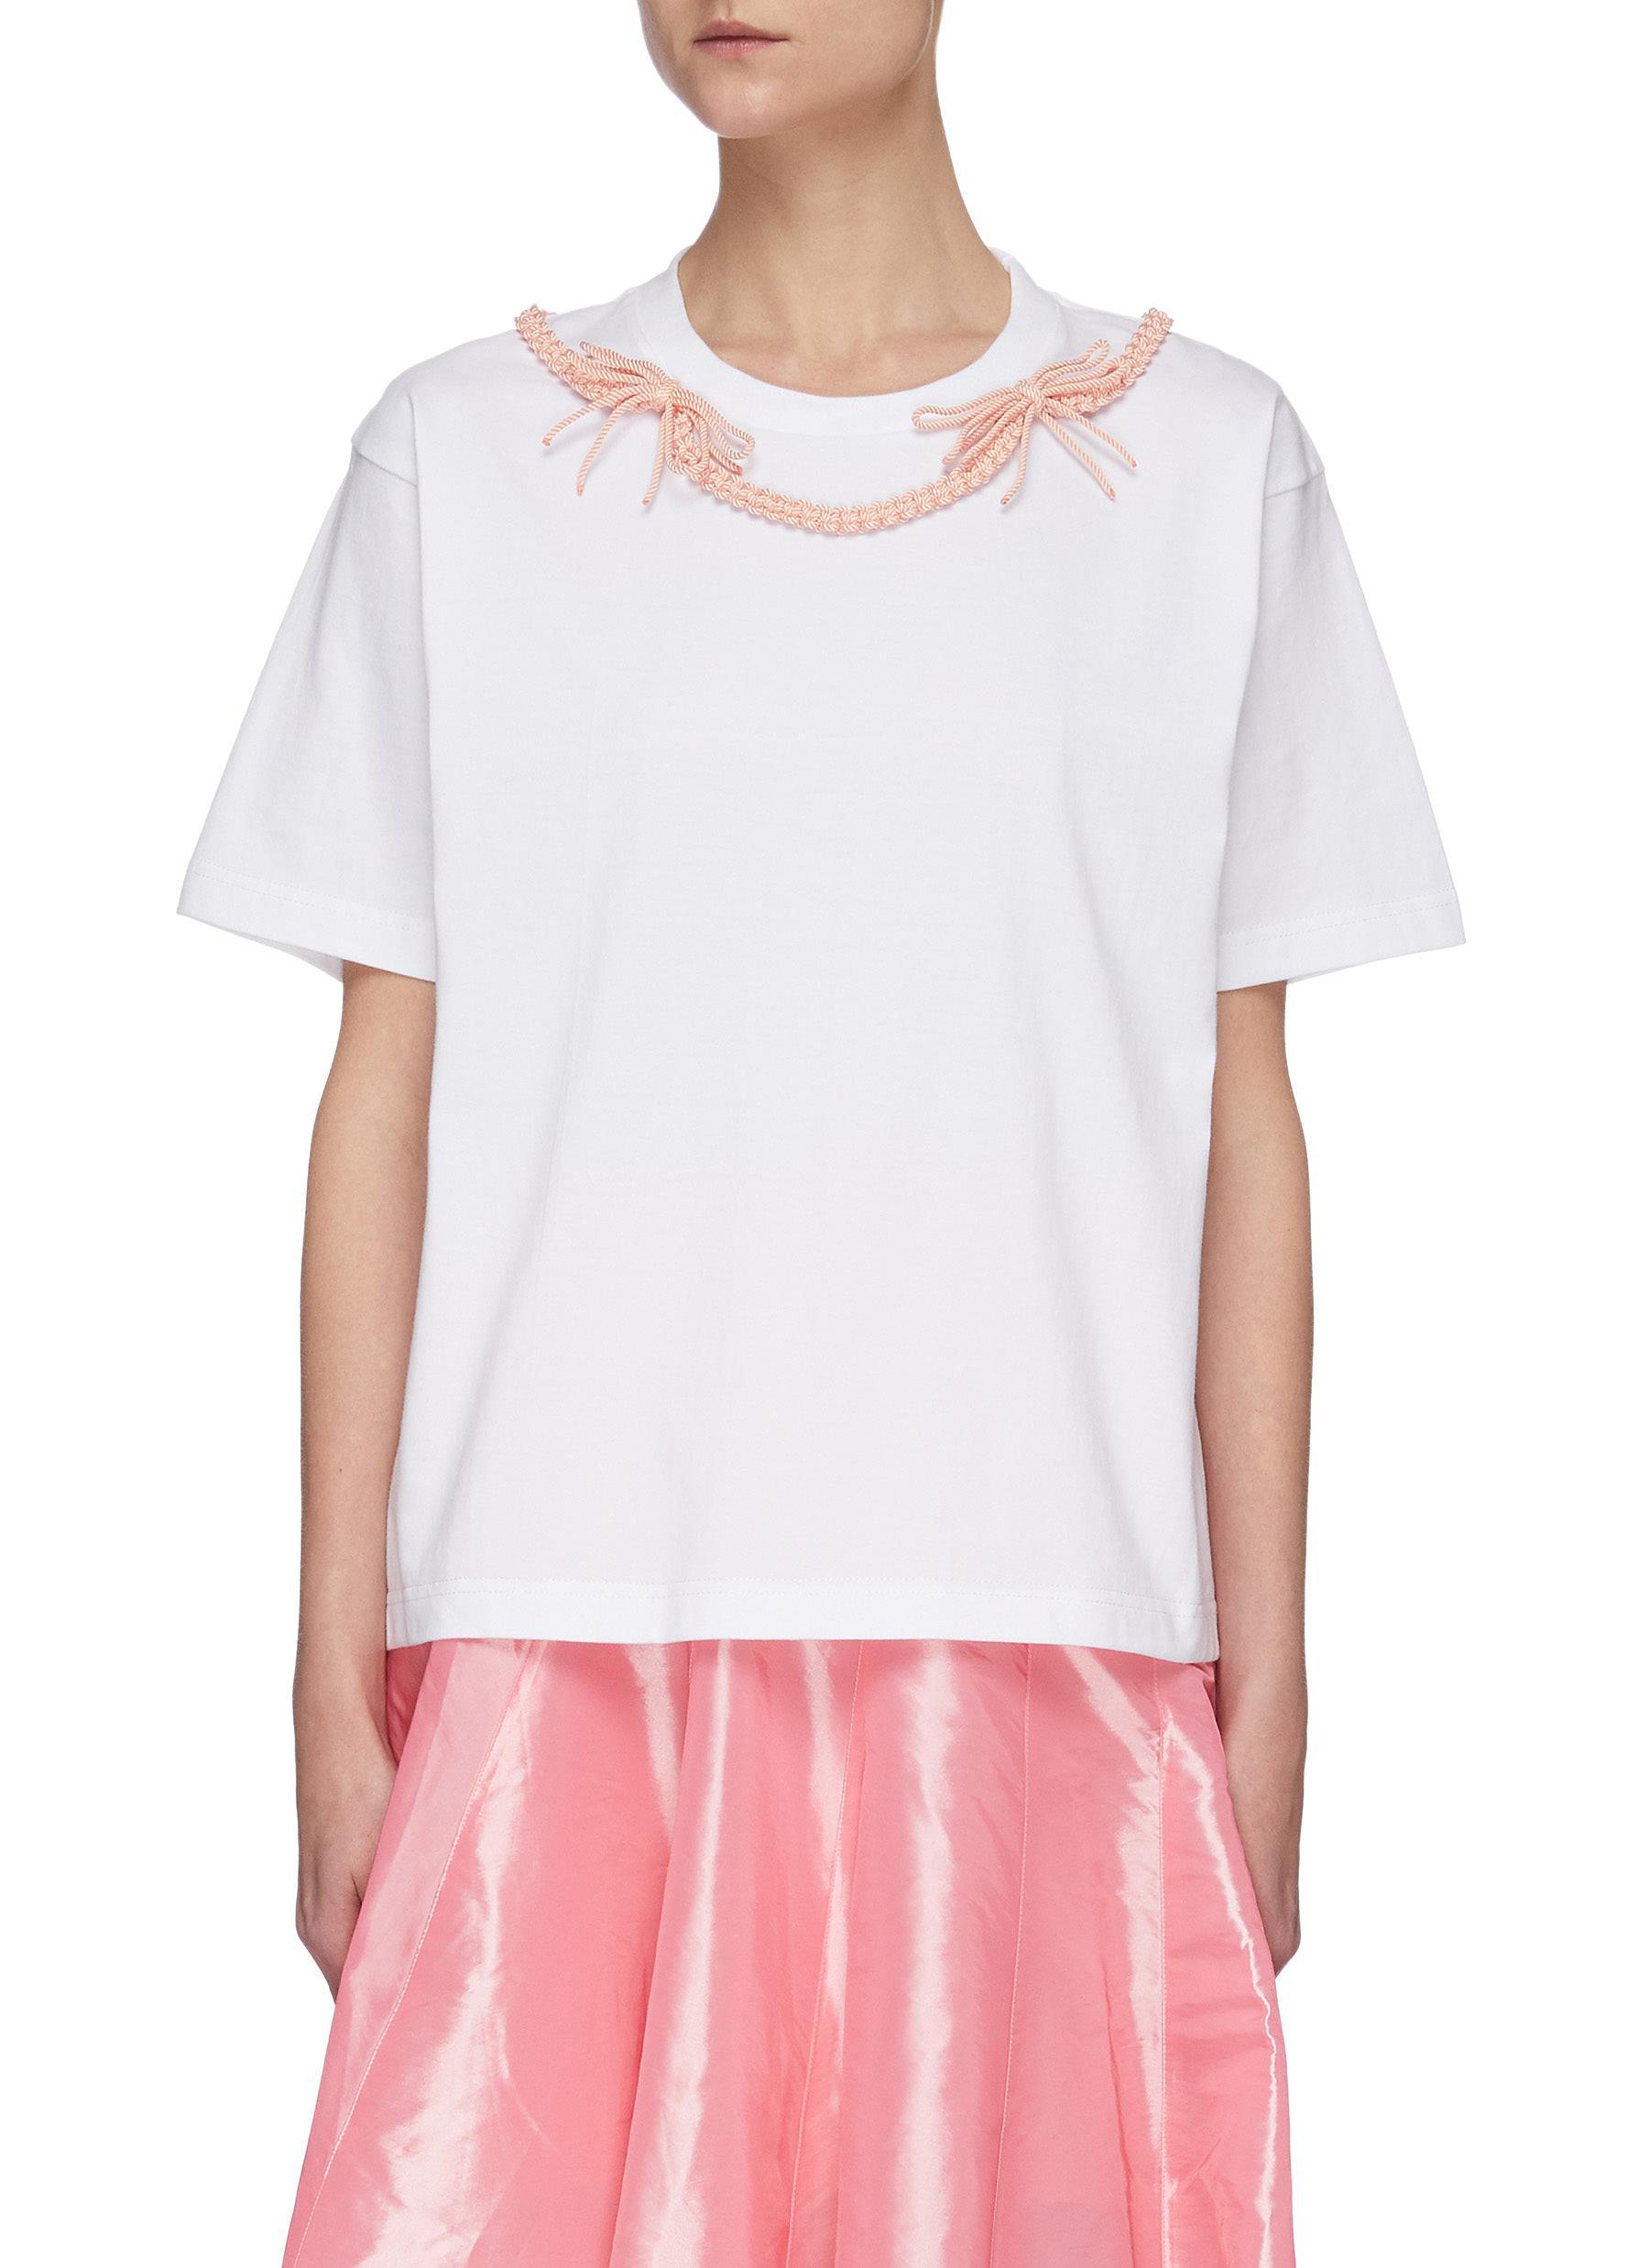 shop Shushu/Tong Braid Bow T-shirt online